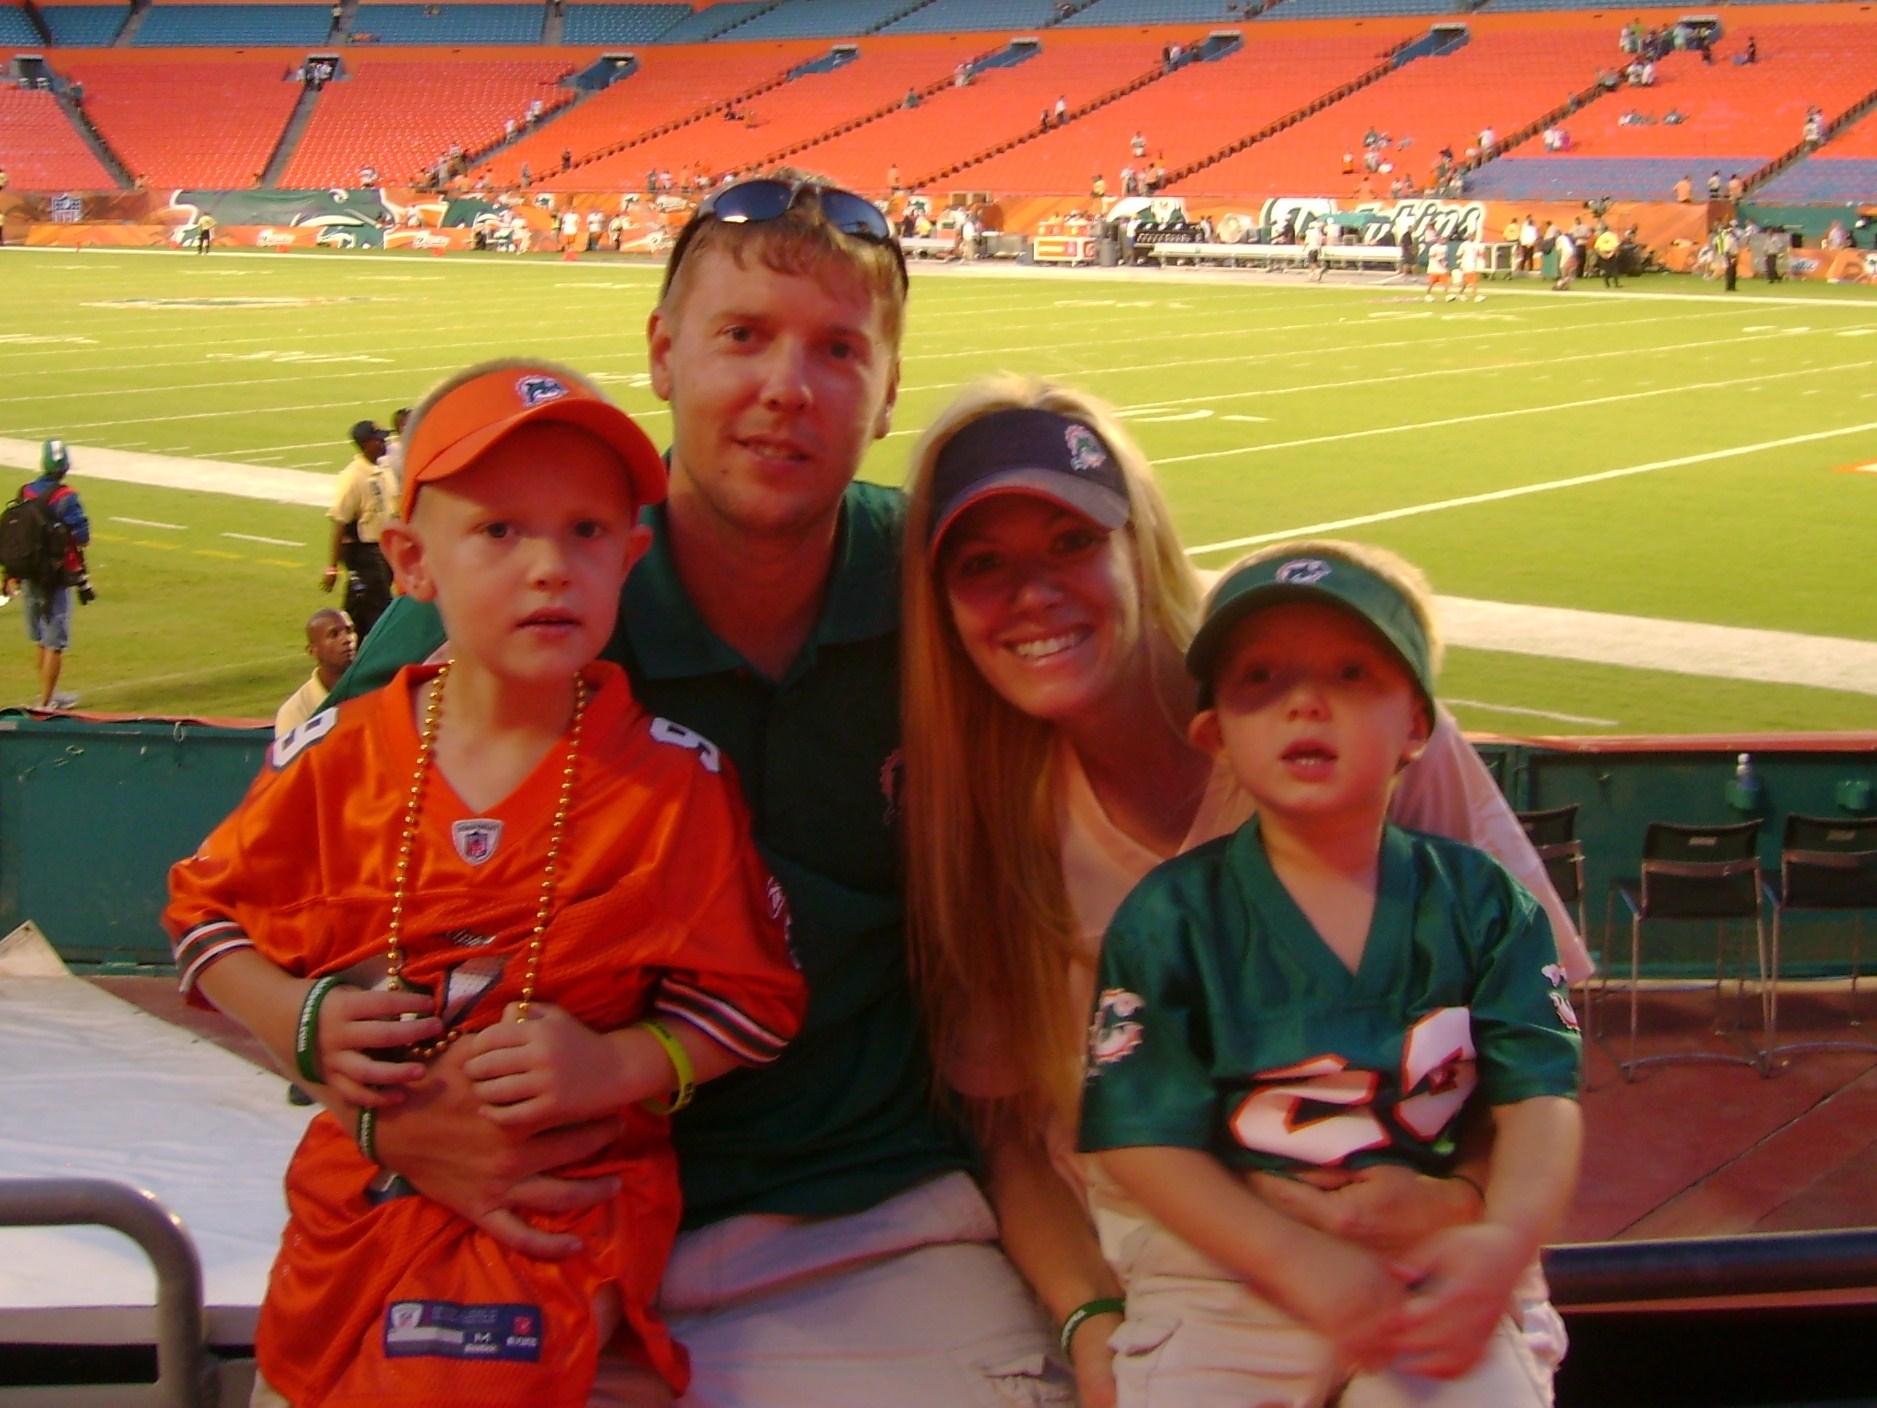 Trenton & family